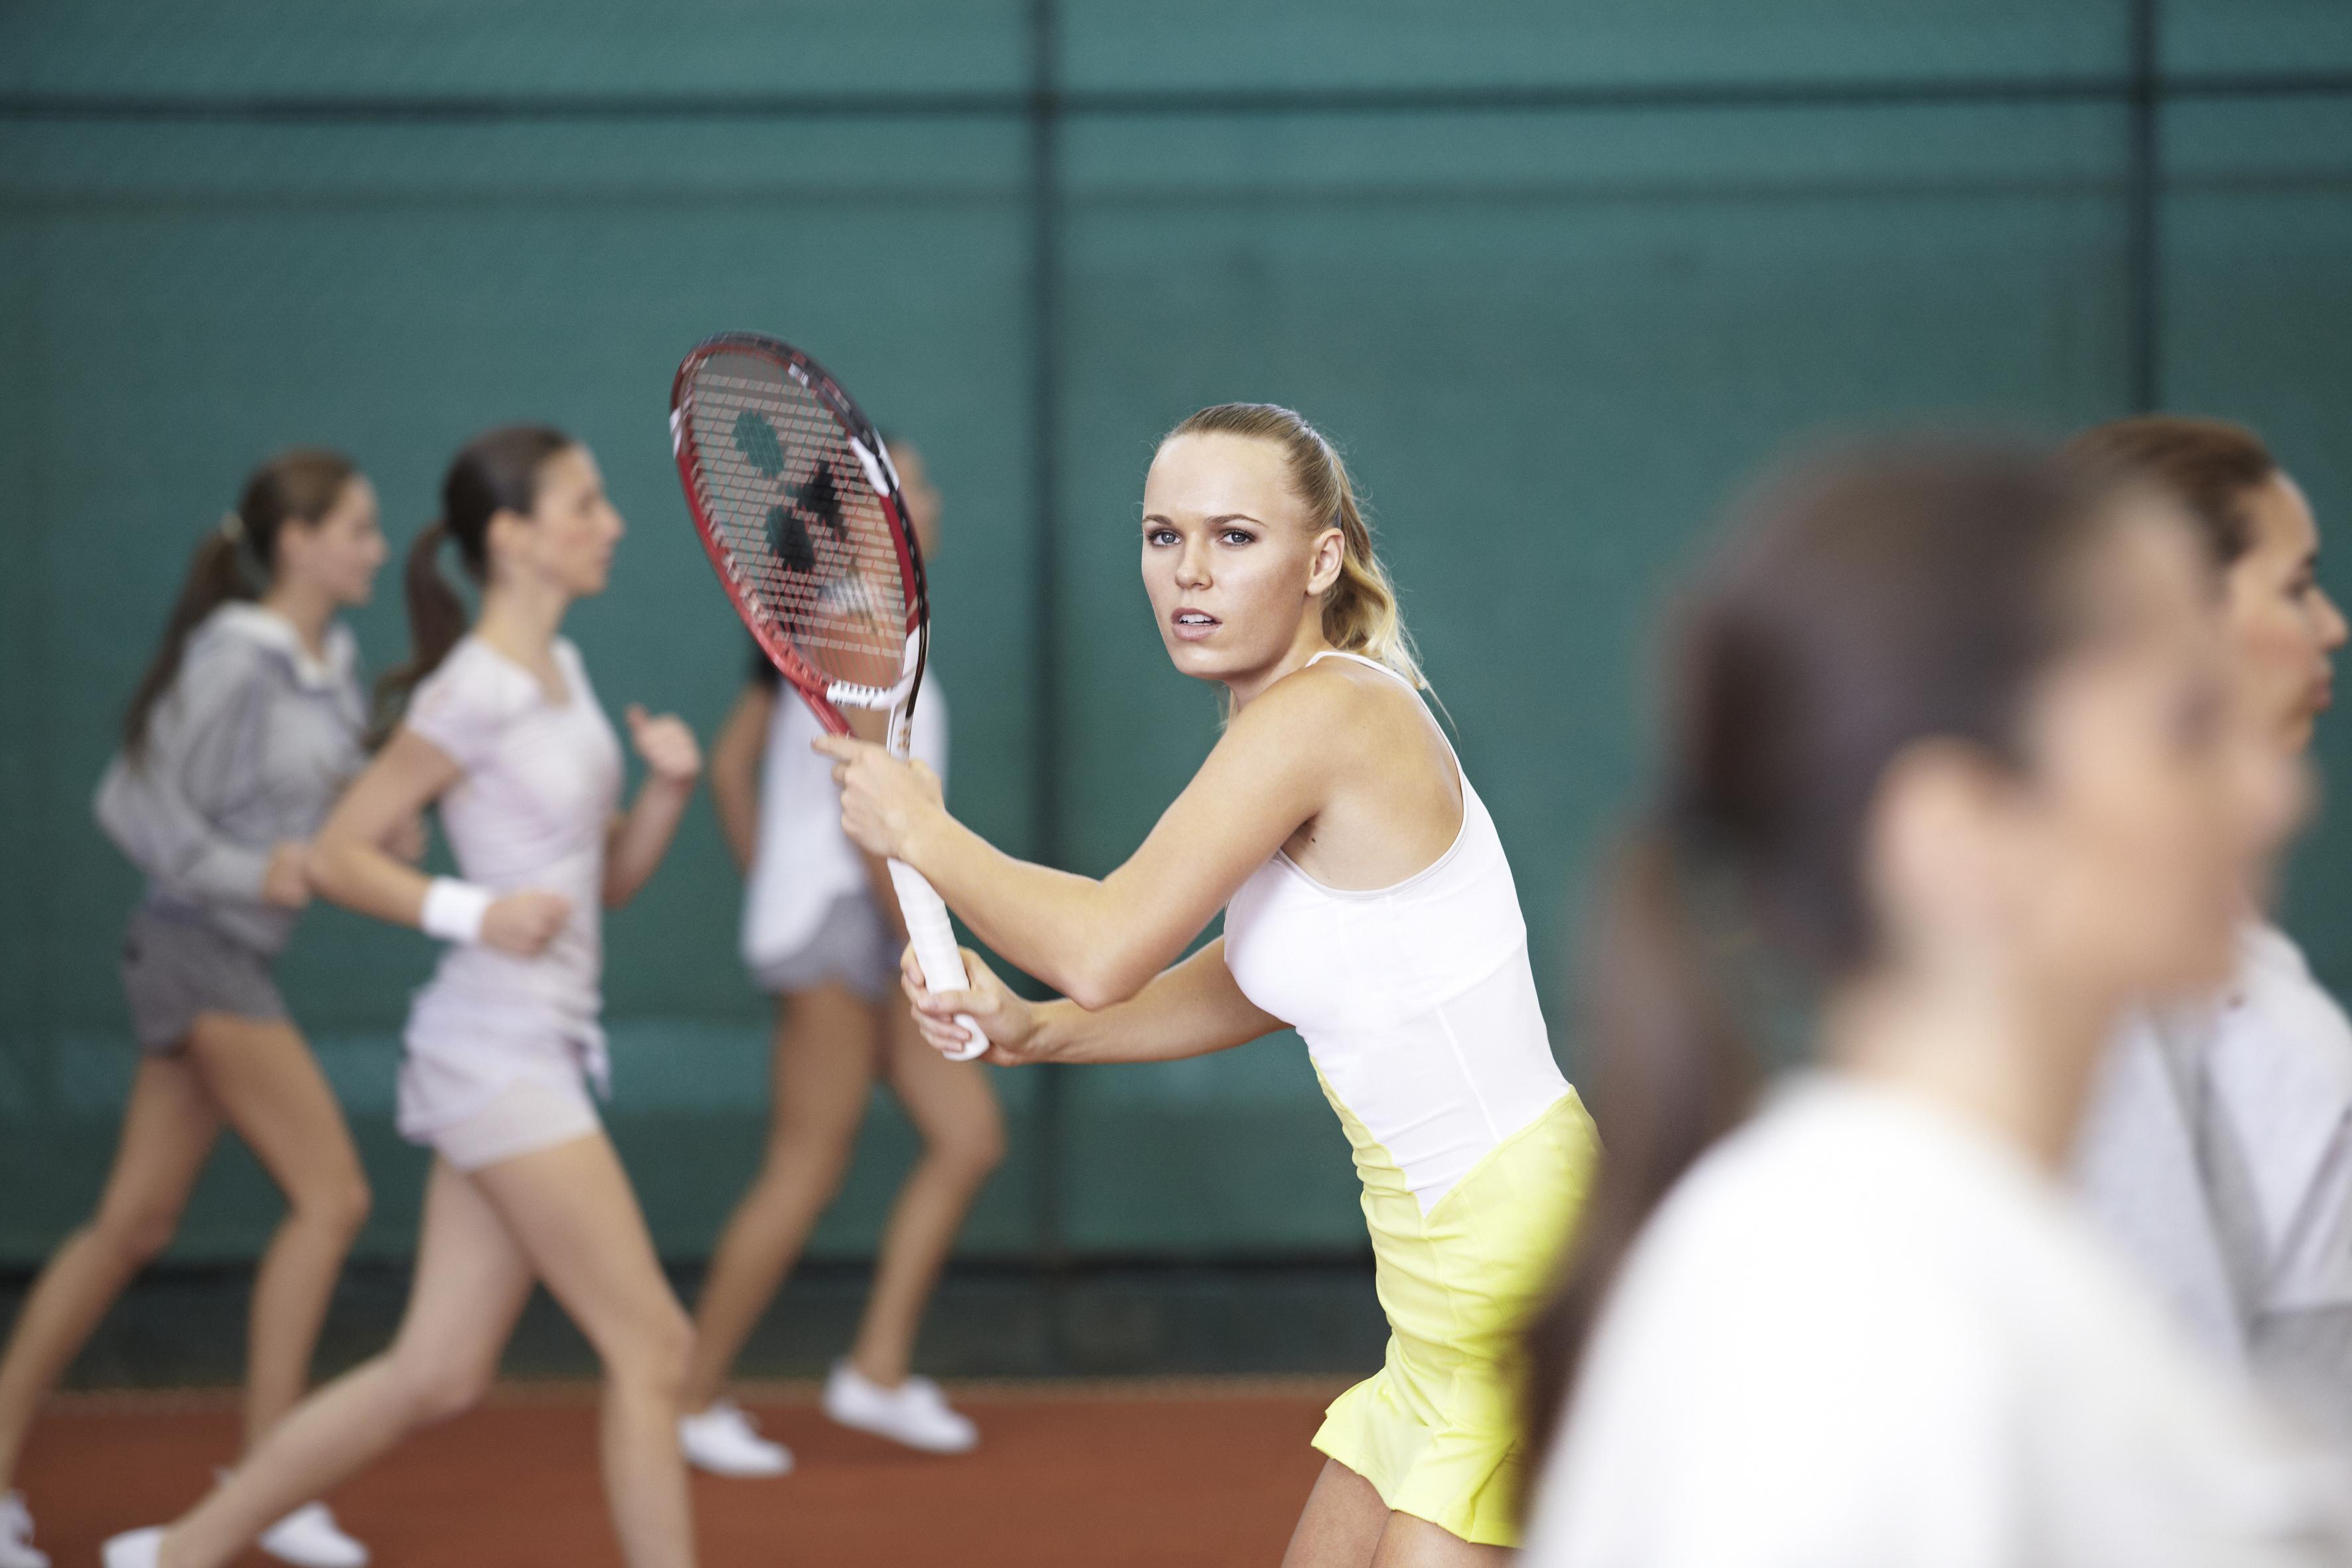 adidas tennis barricade by Stella McCartney - Caroline Wozniacki